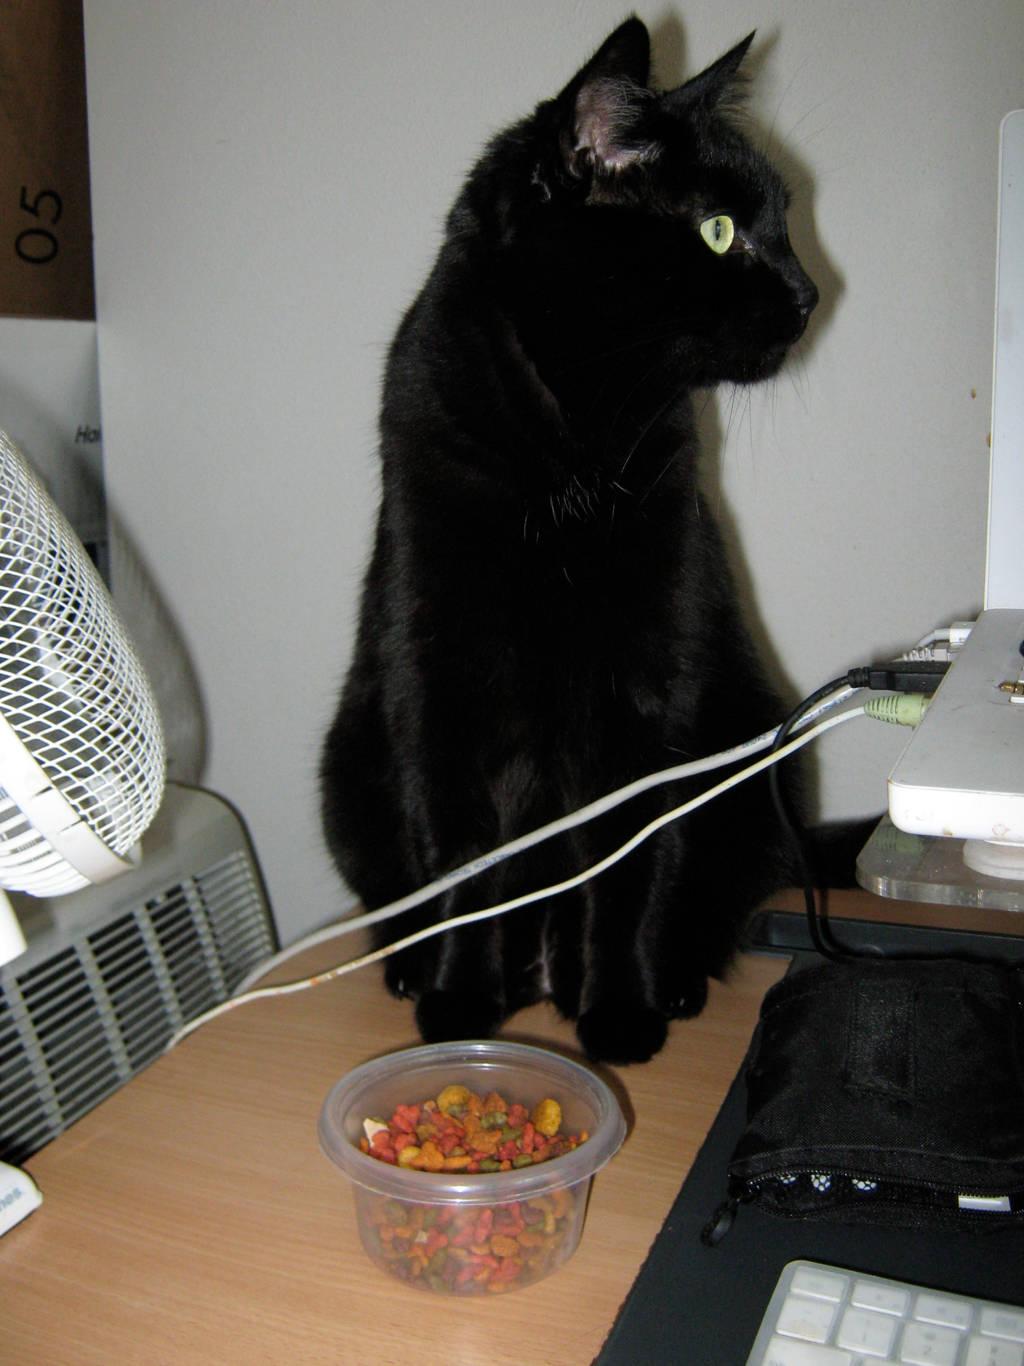 Curious cat, 1 by Cericonversion